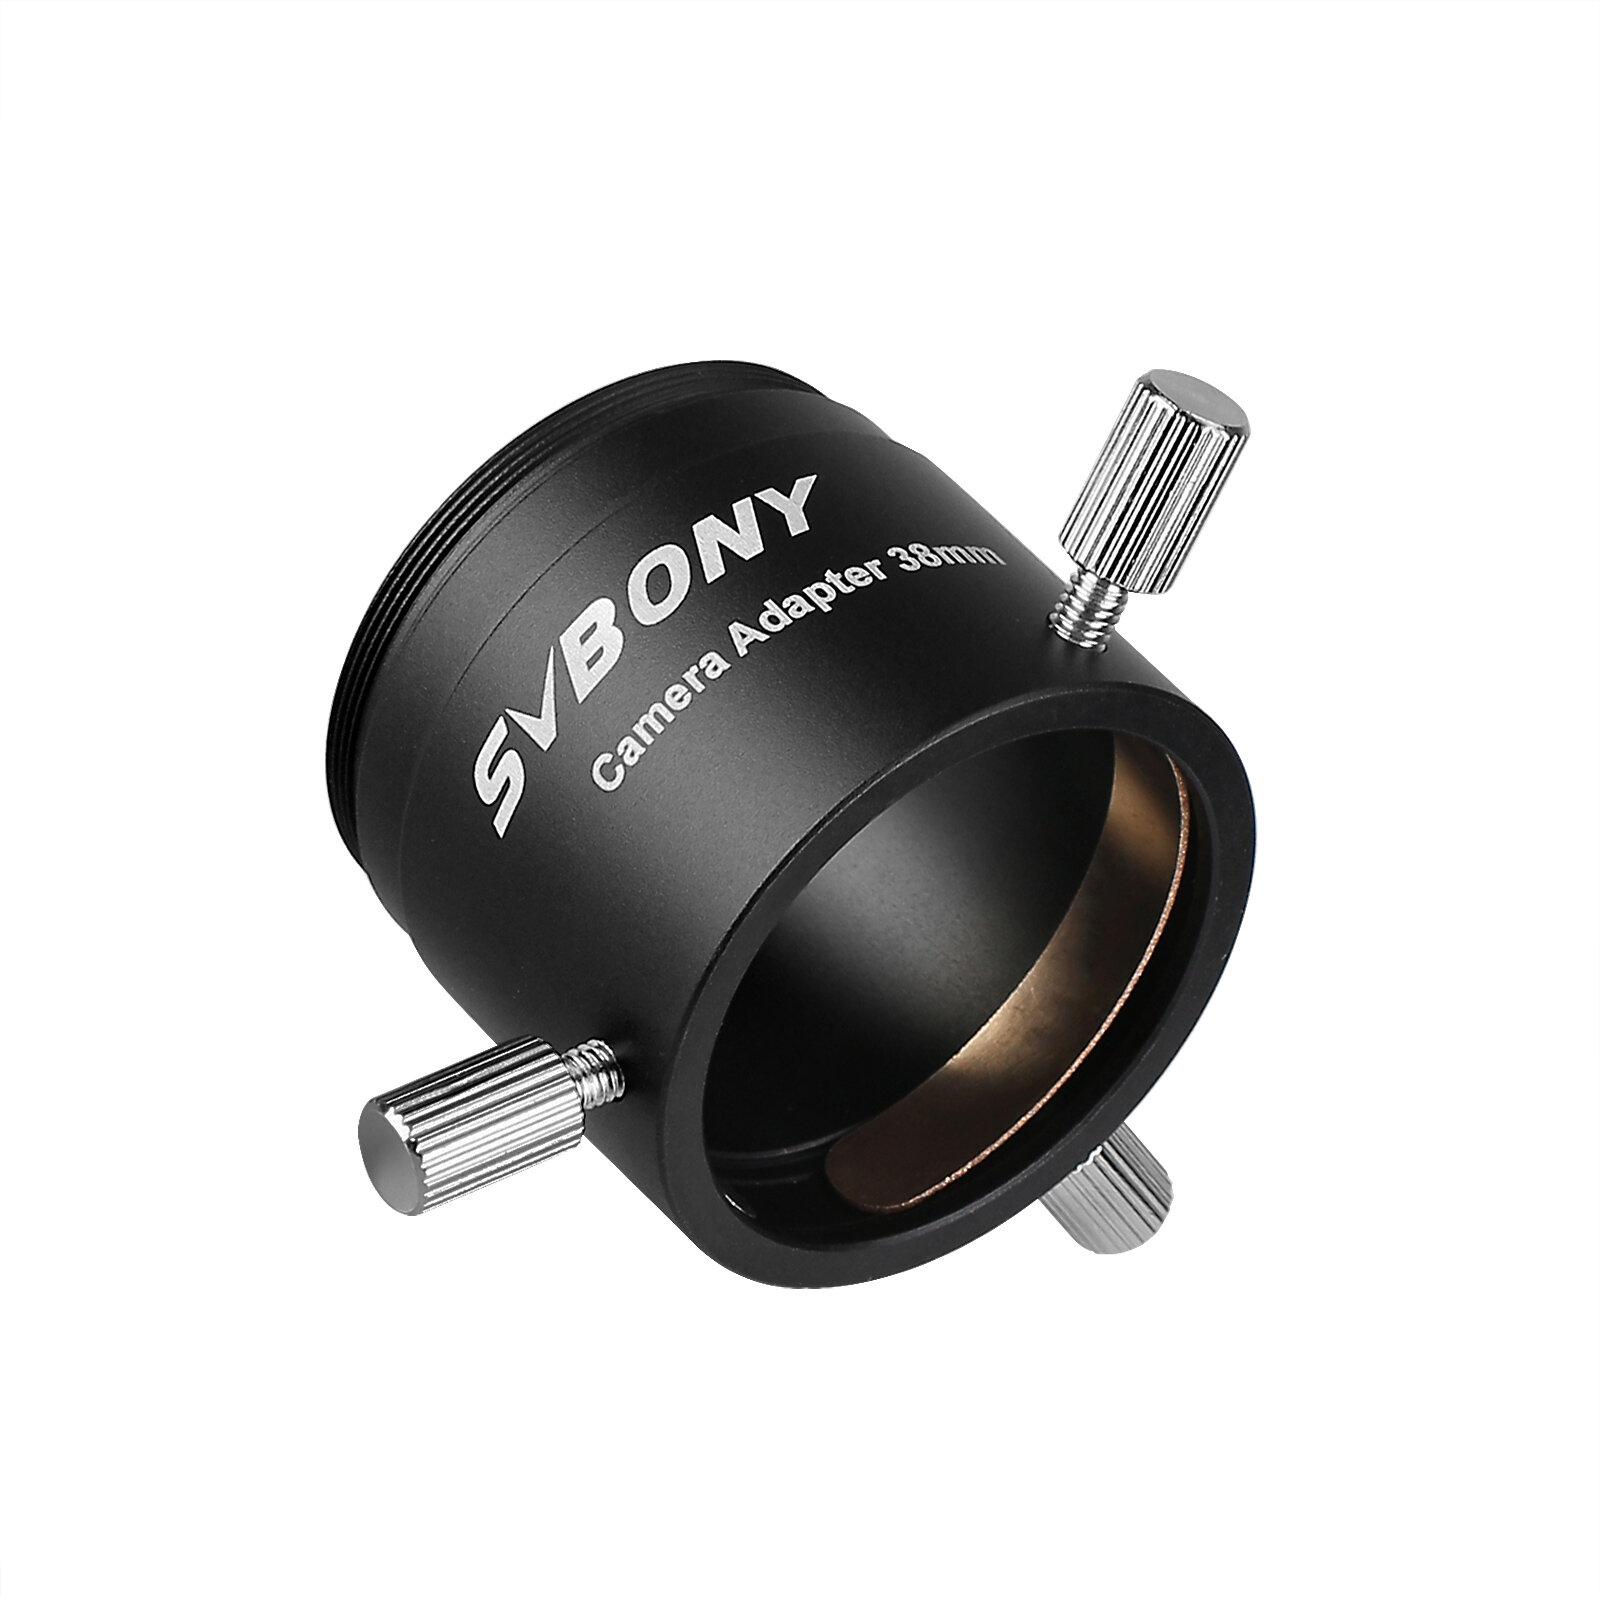 SVBONY SV186 Universal T2 Camera Photo Adapter for Telescope Spotting Scope Eyepieces Adaptor Inner Diameter 38mm